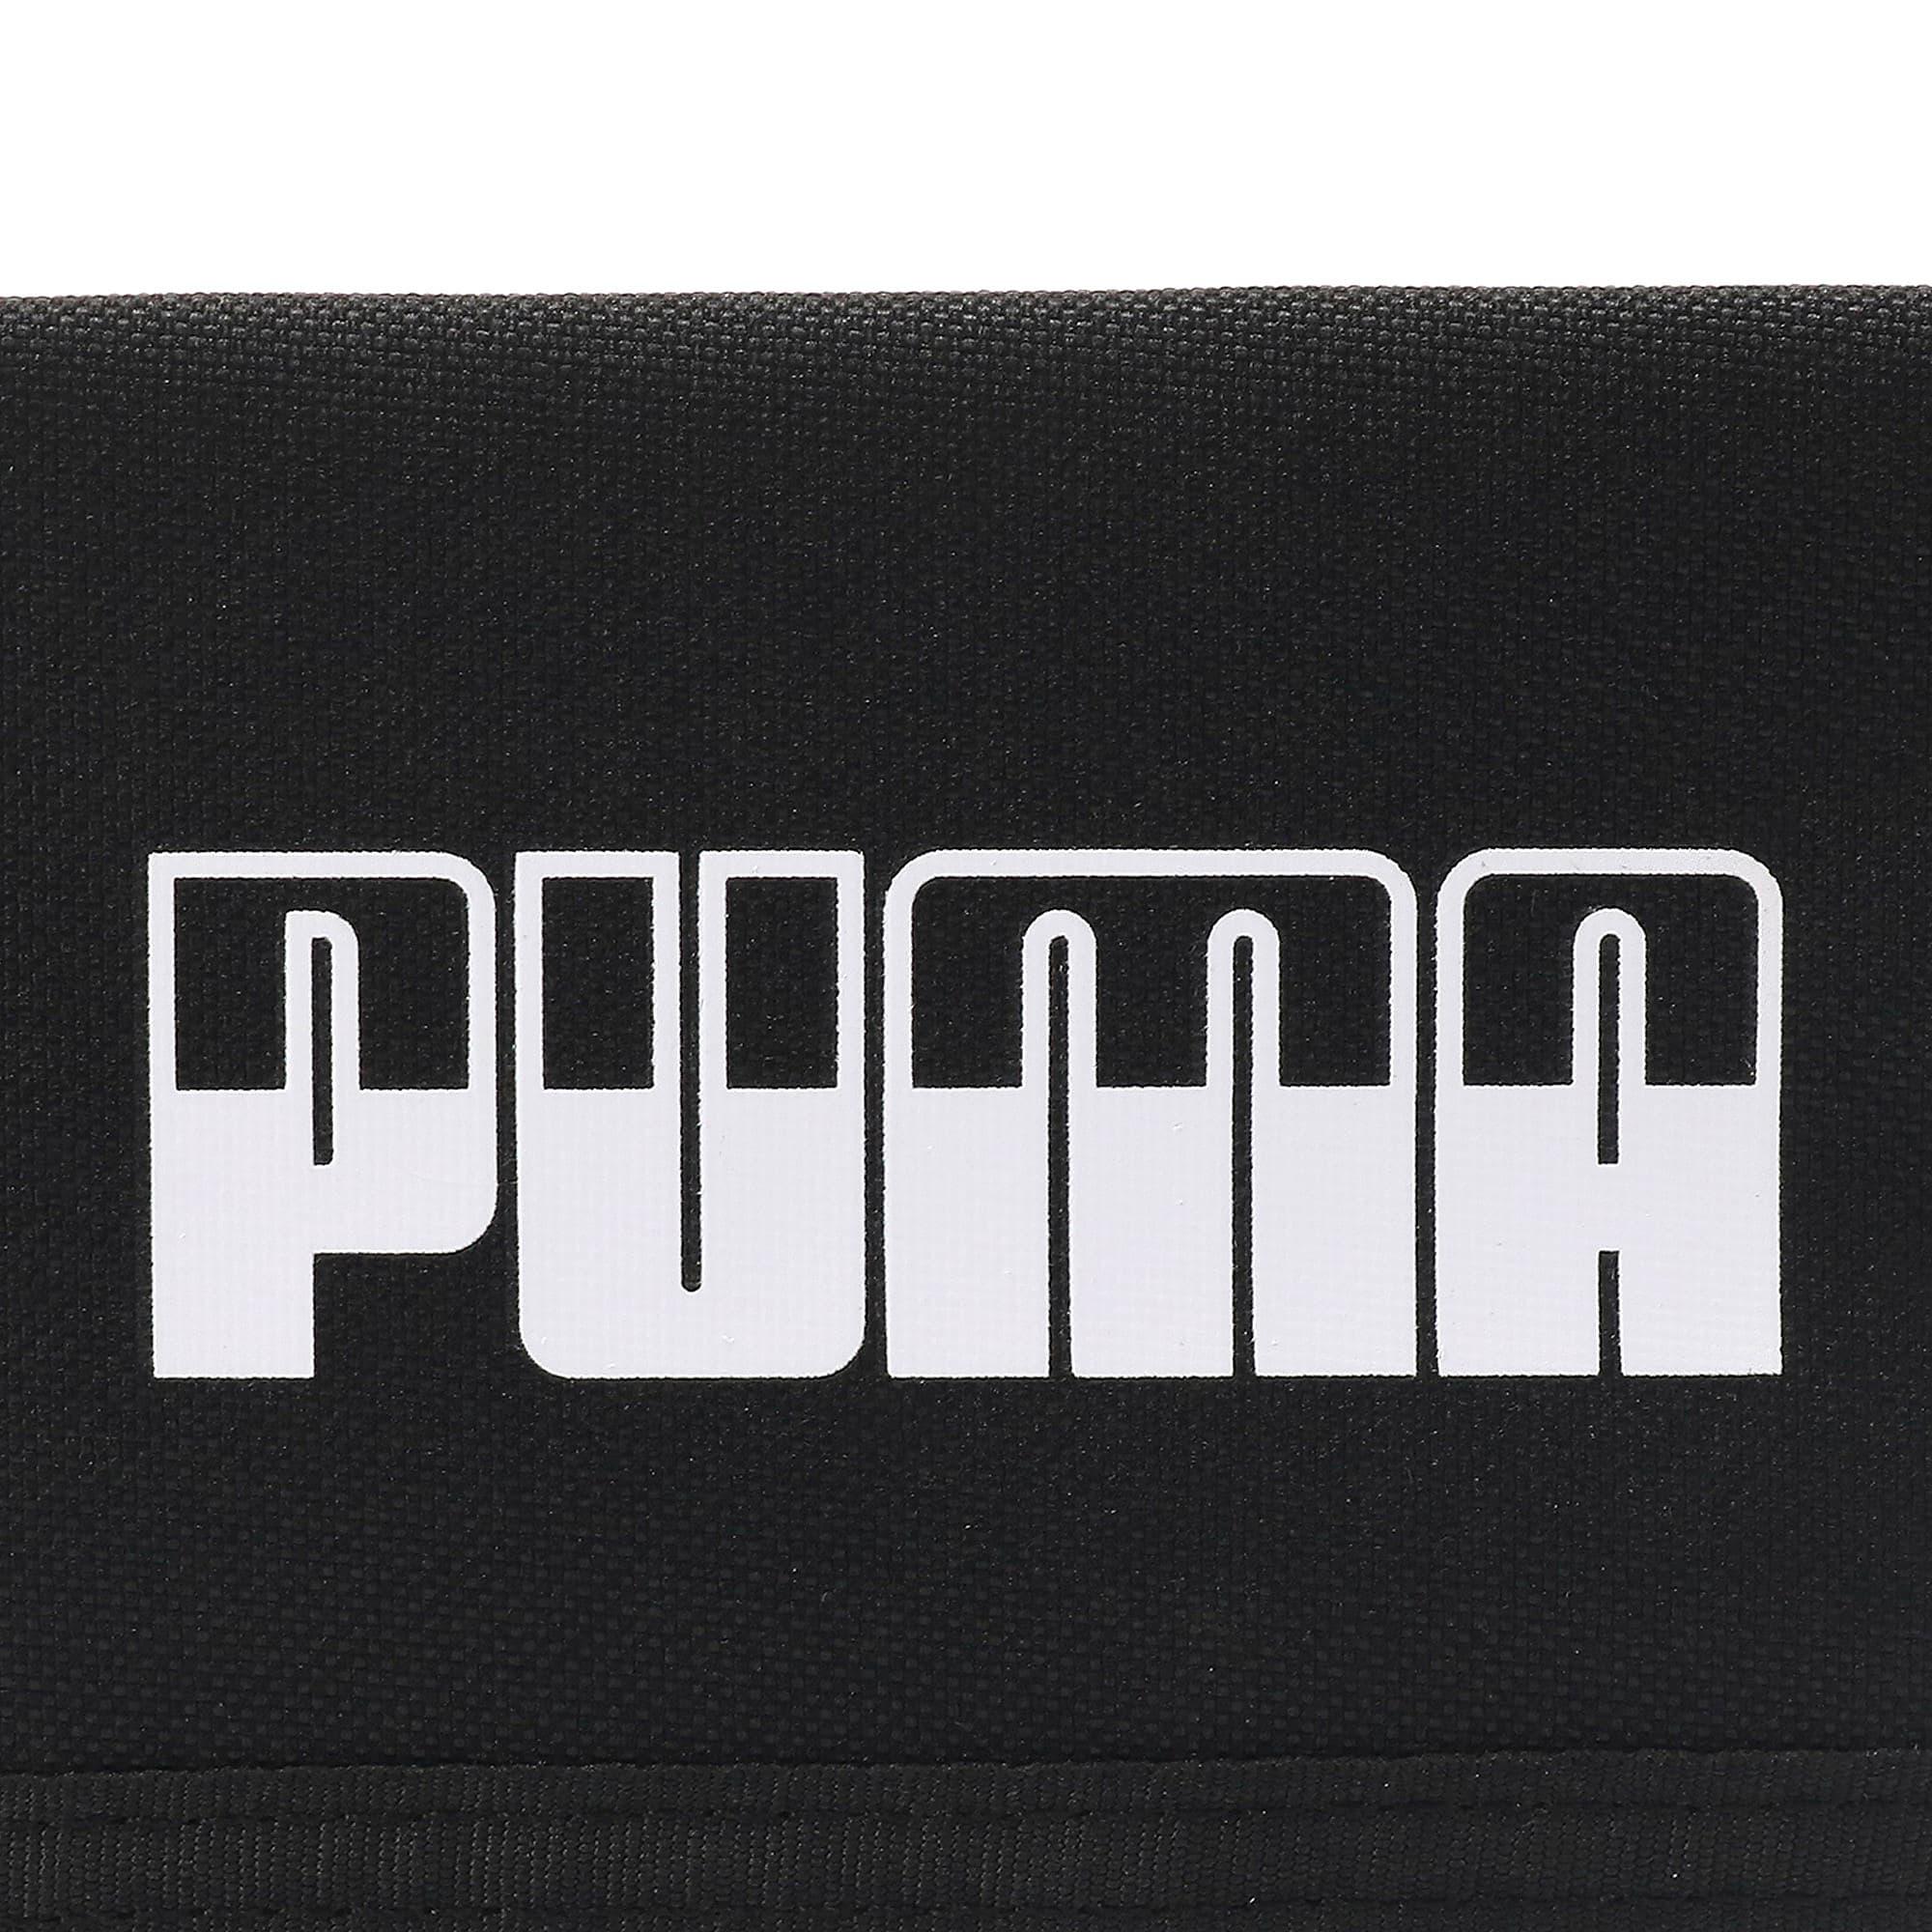 Thumbnail 3 of プーマ プラス ウォレット II, Puma Black, medium-JPN